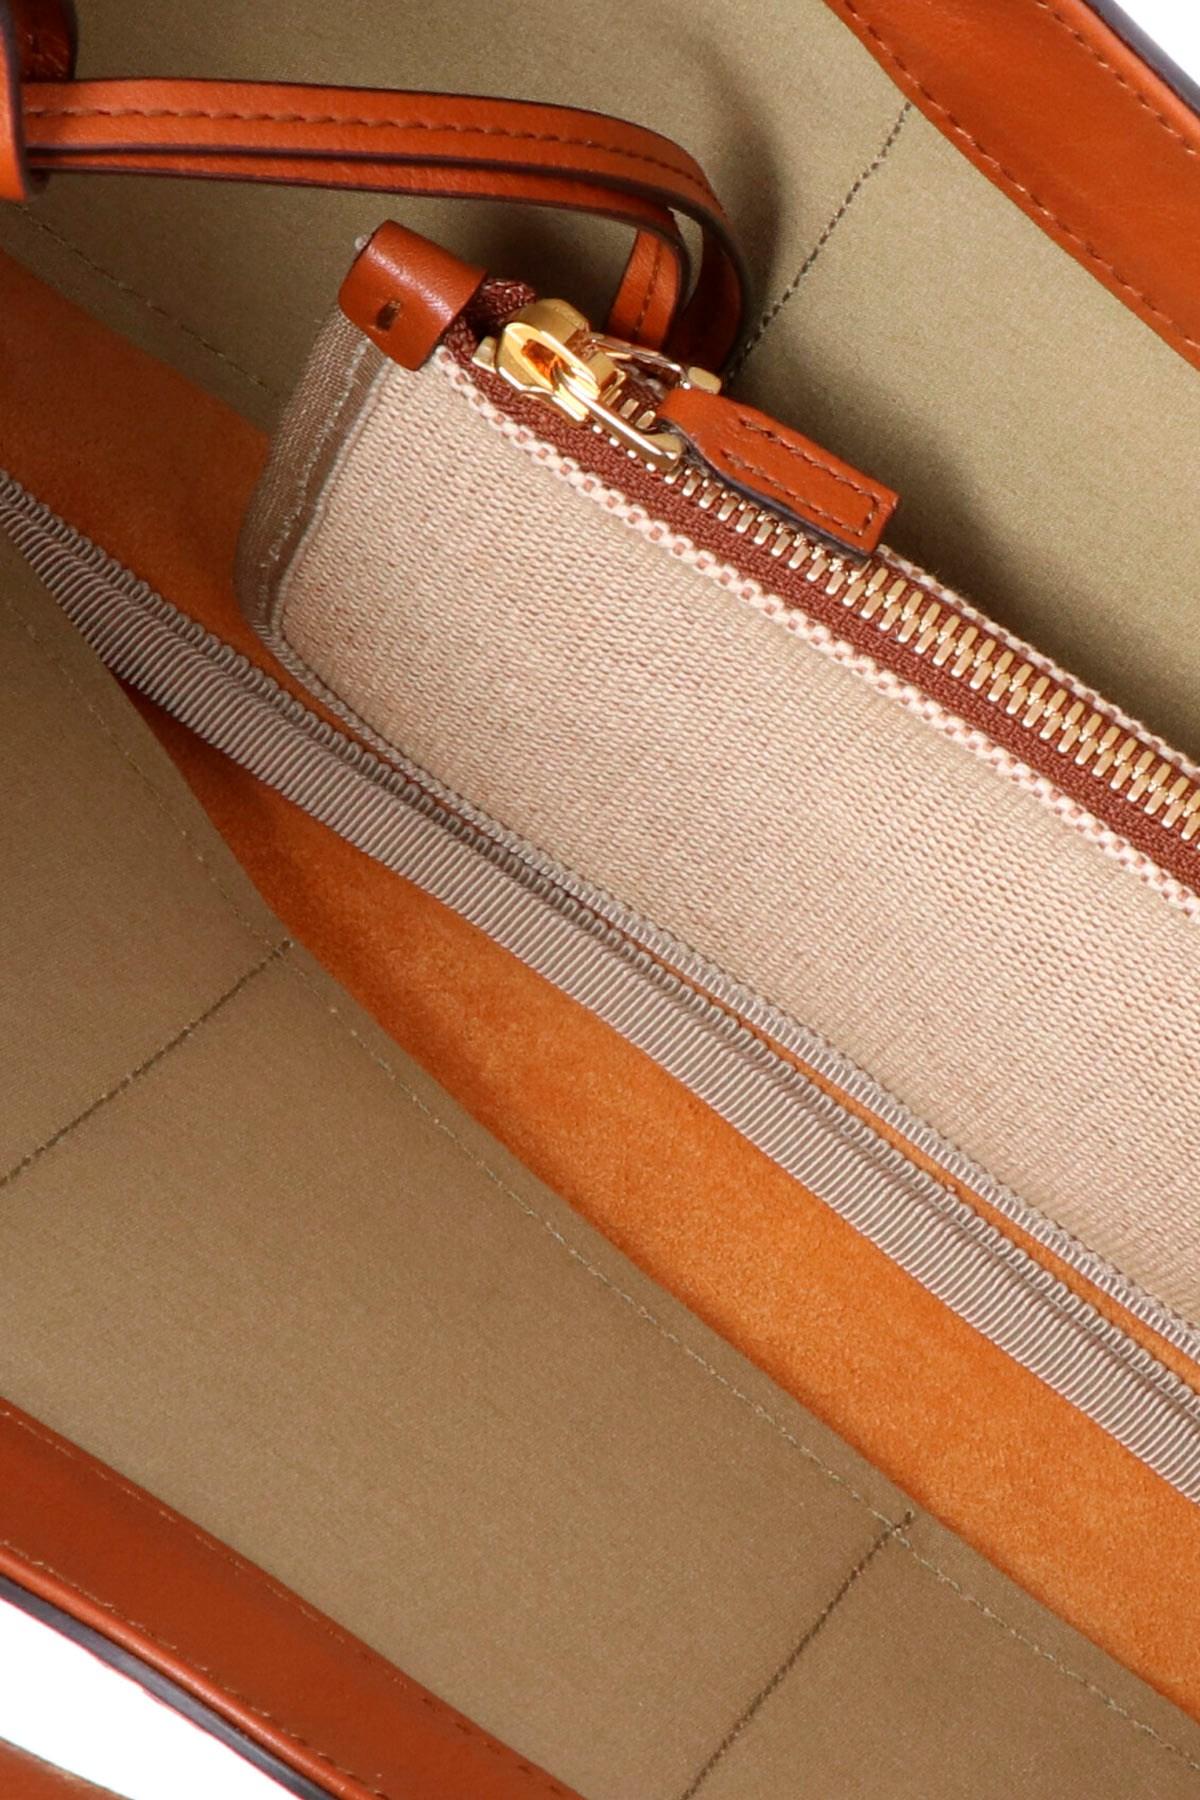 40f7404e1d0d gucci 'GG vintage' tote available on julian-fashion.com - 89362